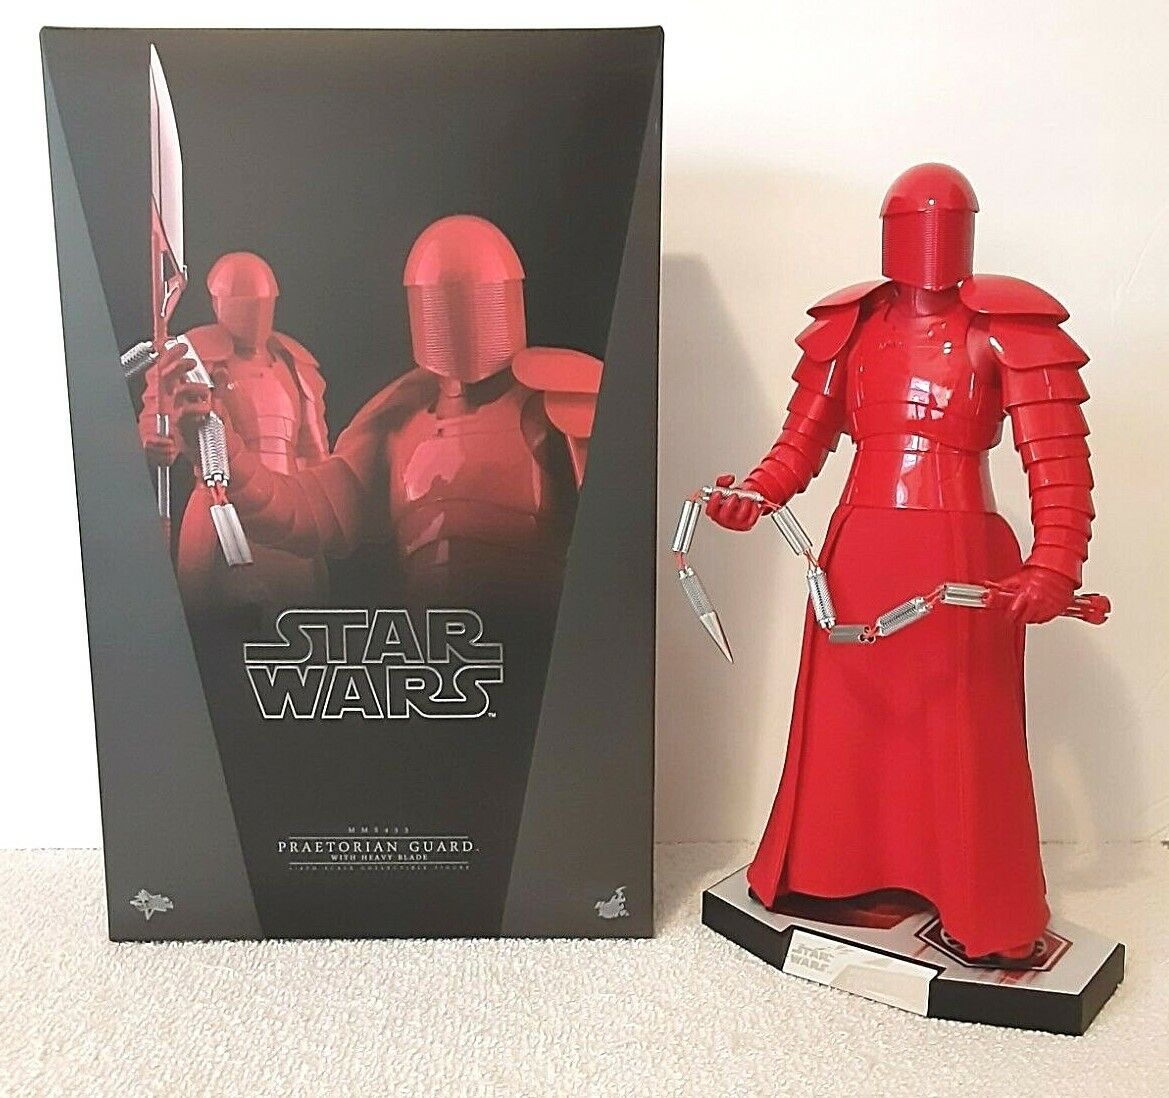 Hot Toys Star Wars: The Last Jedi Praetorian Guard (Heavy Blade) 1/6 Figure  on eBay thumbnail